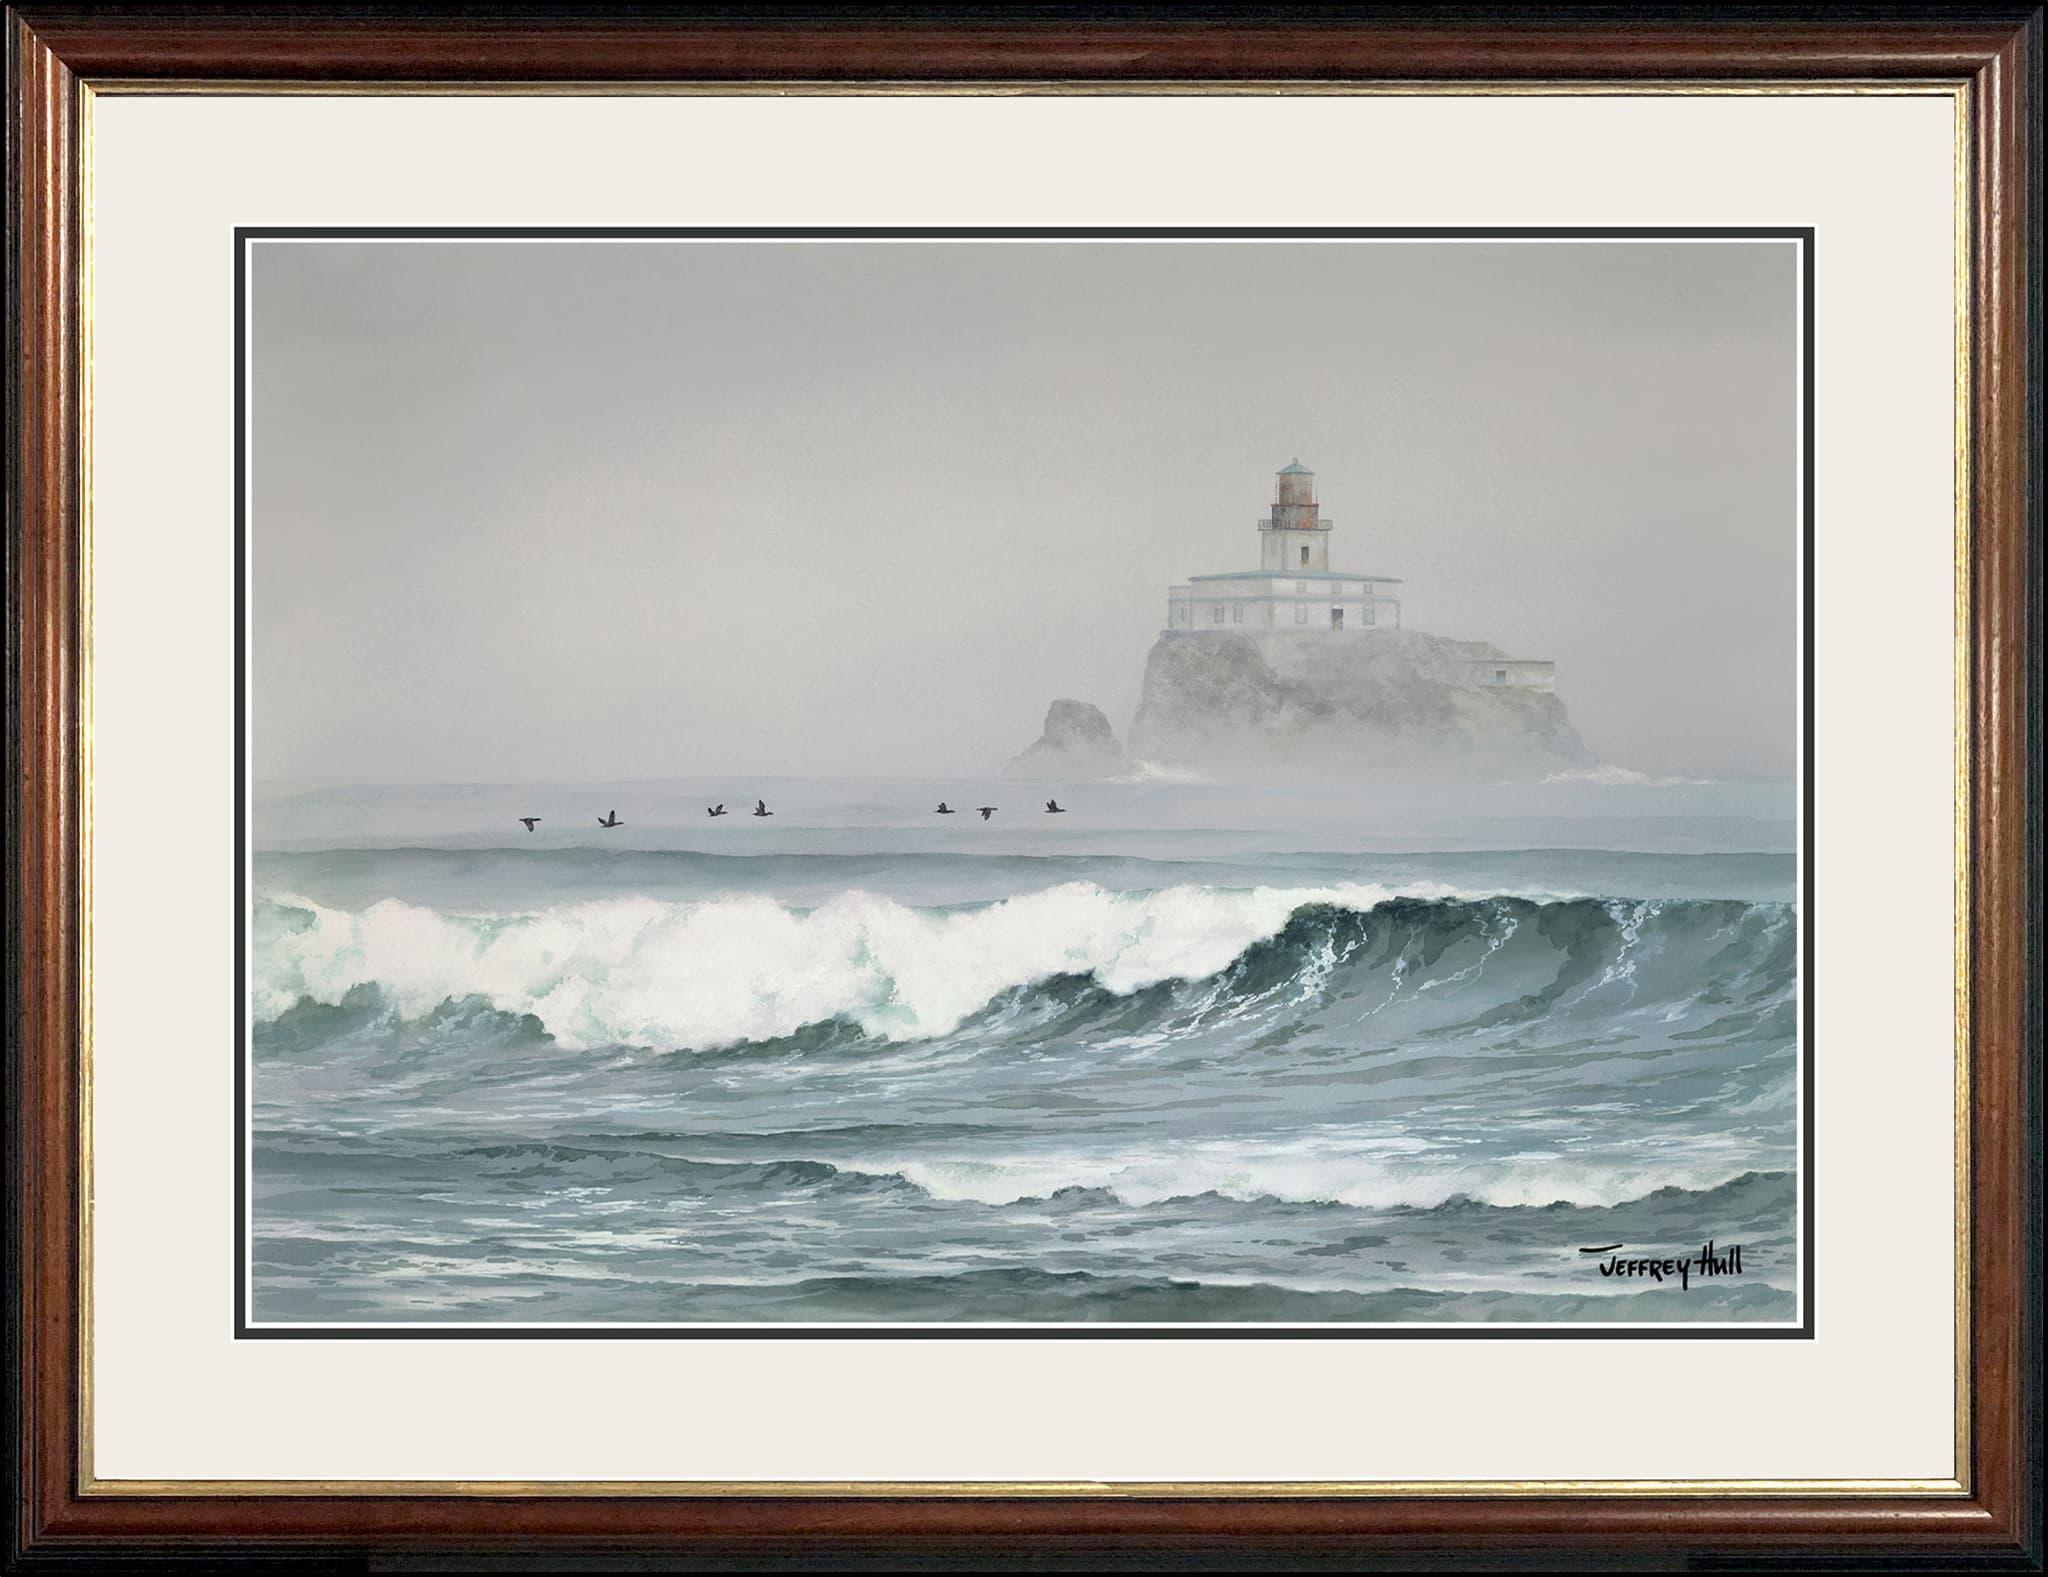 Tillamook-Rock-Lighthouse-LimEd-Malabar-Talc-Dark-Shale-4-Website-2021